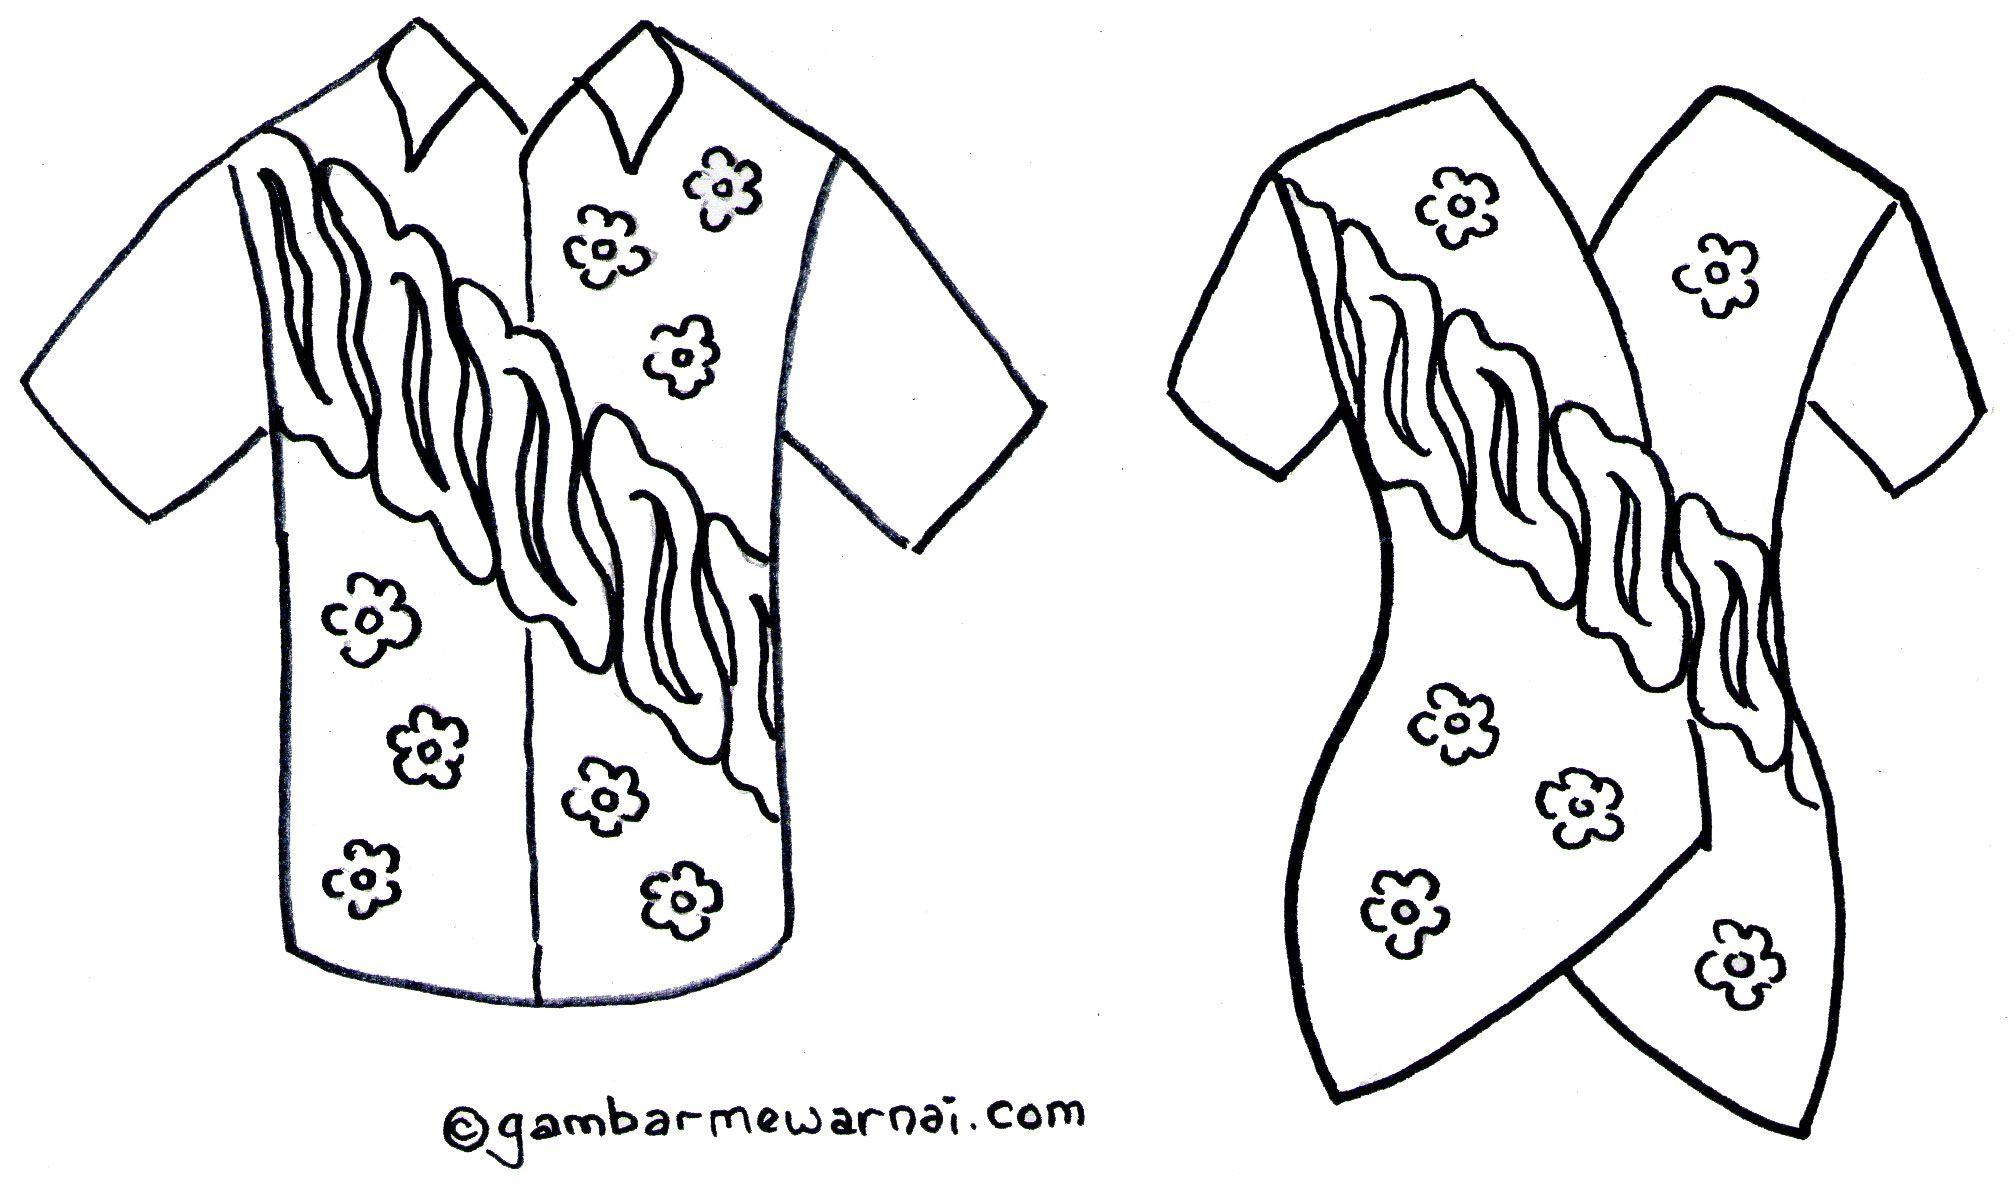 Gambar Mewarnai Baju